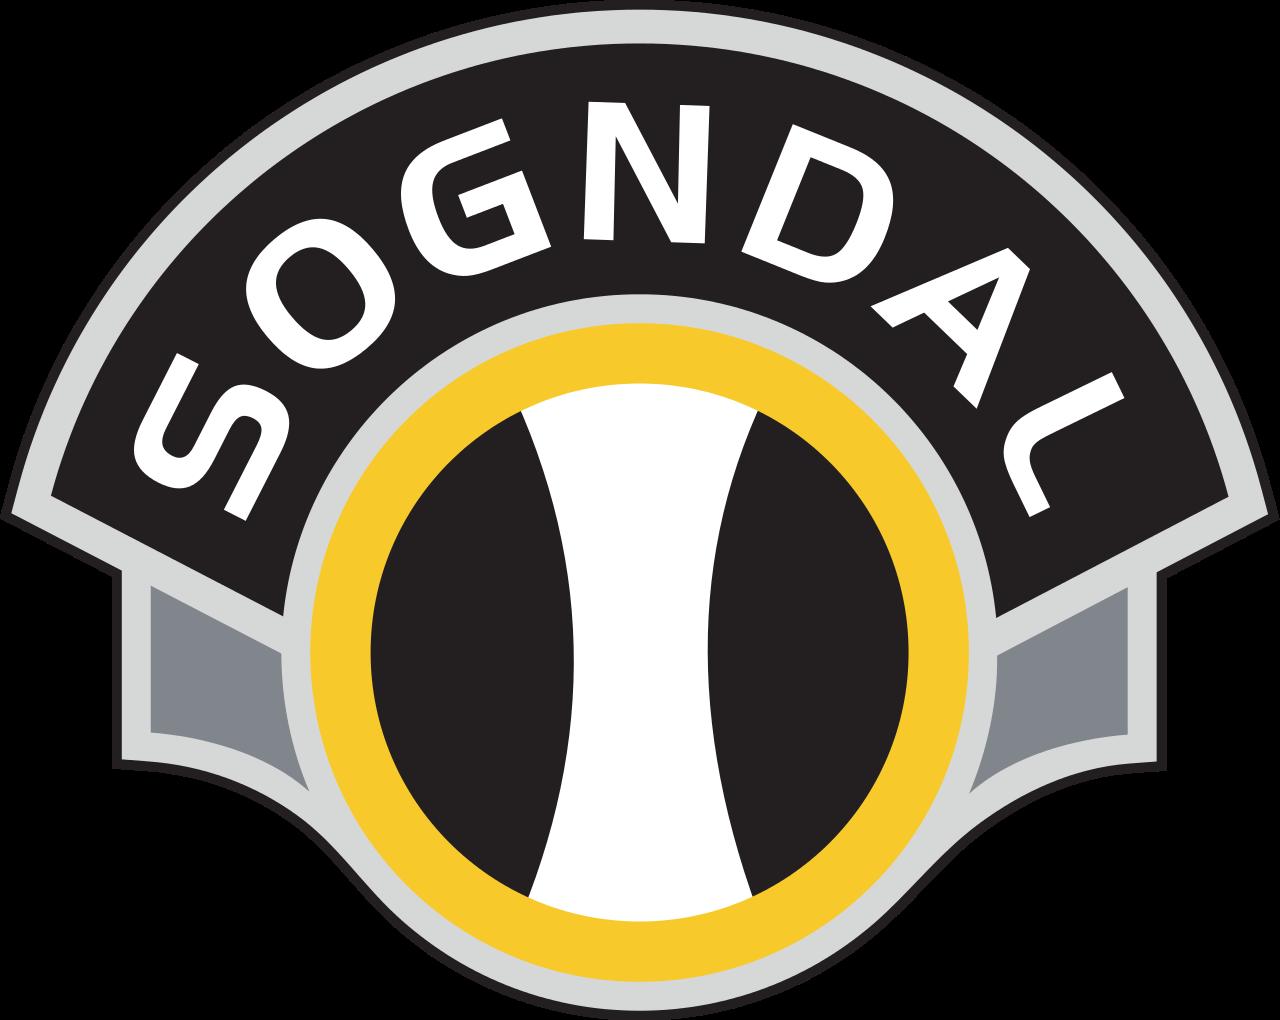 Ставки на футбол на Стабек – Согндал. Ставки на чемпионат Норвегии, 19 Ноября 2017